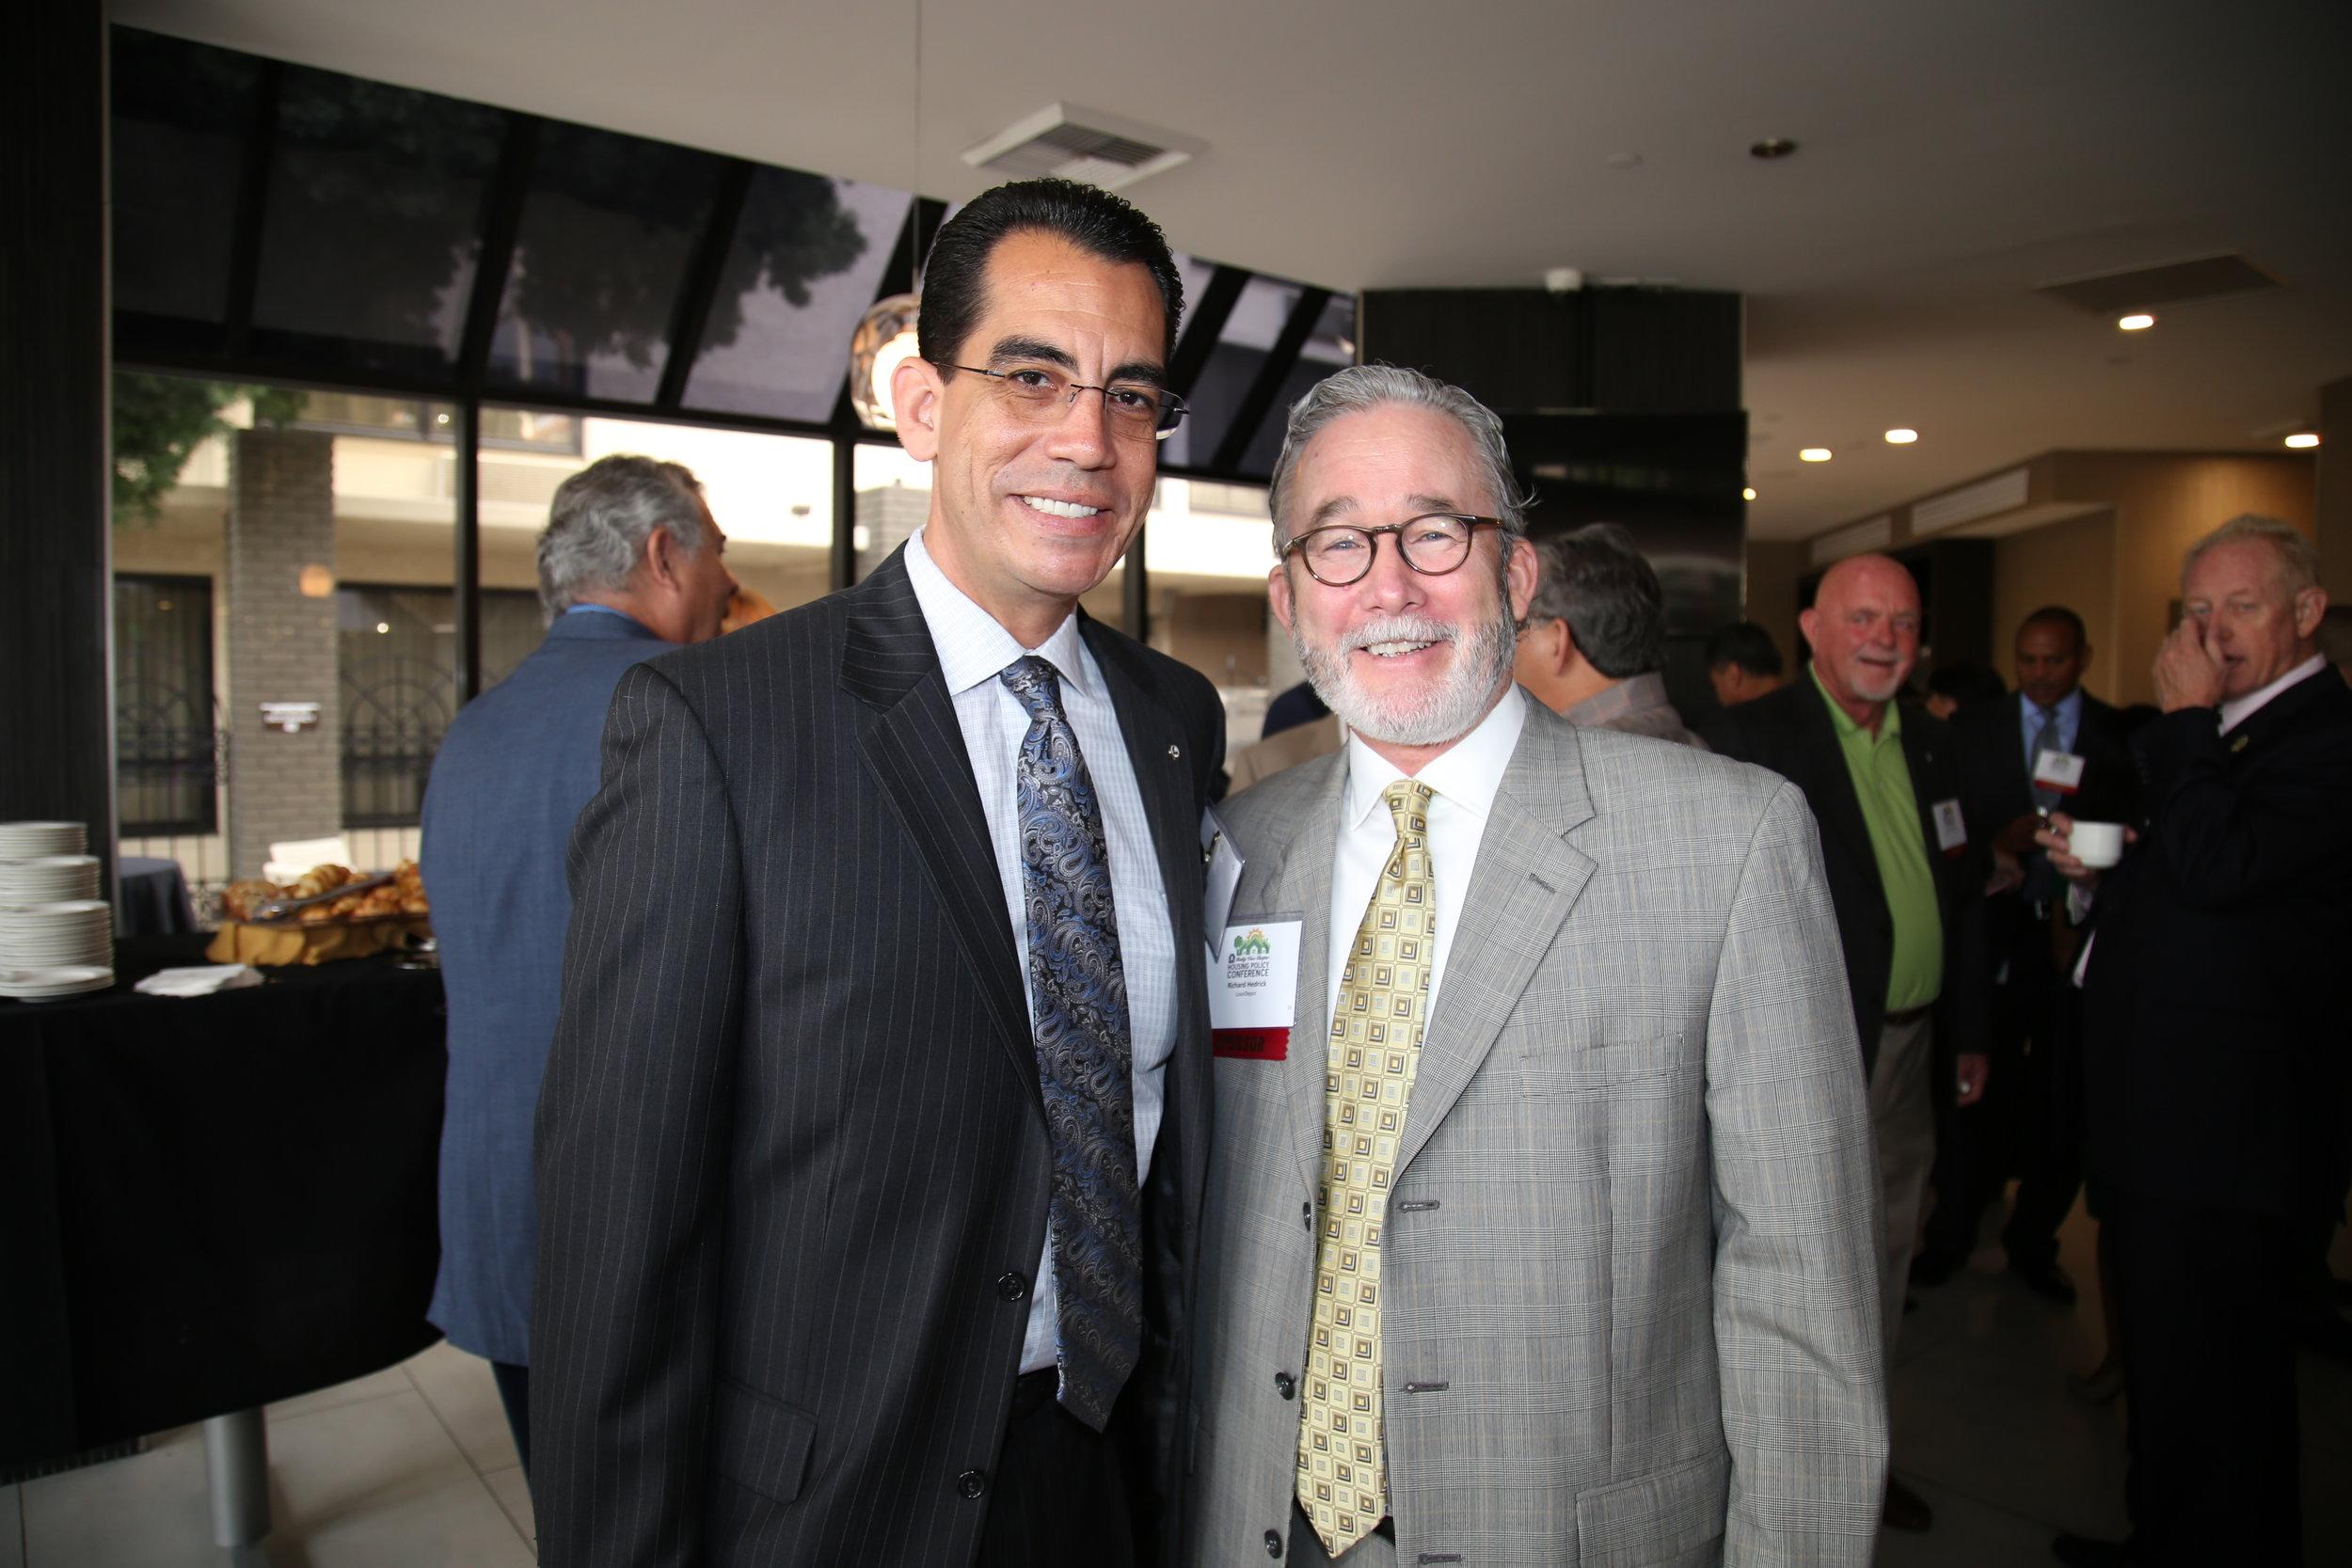 CEO Carlos Rodriguez and American Spirit Sponsor loanDepot's Richard Hedrick